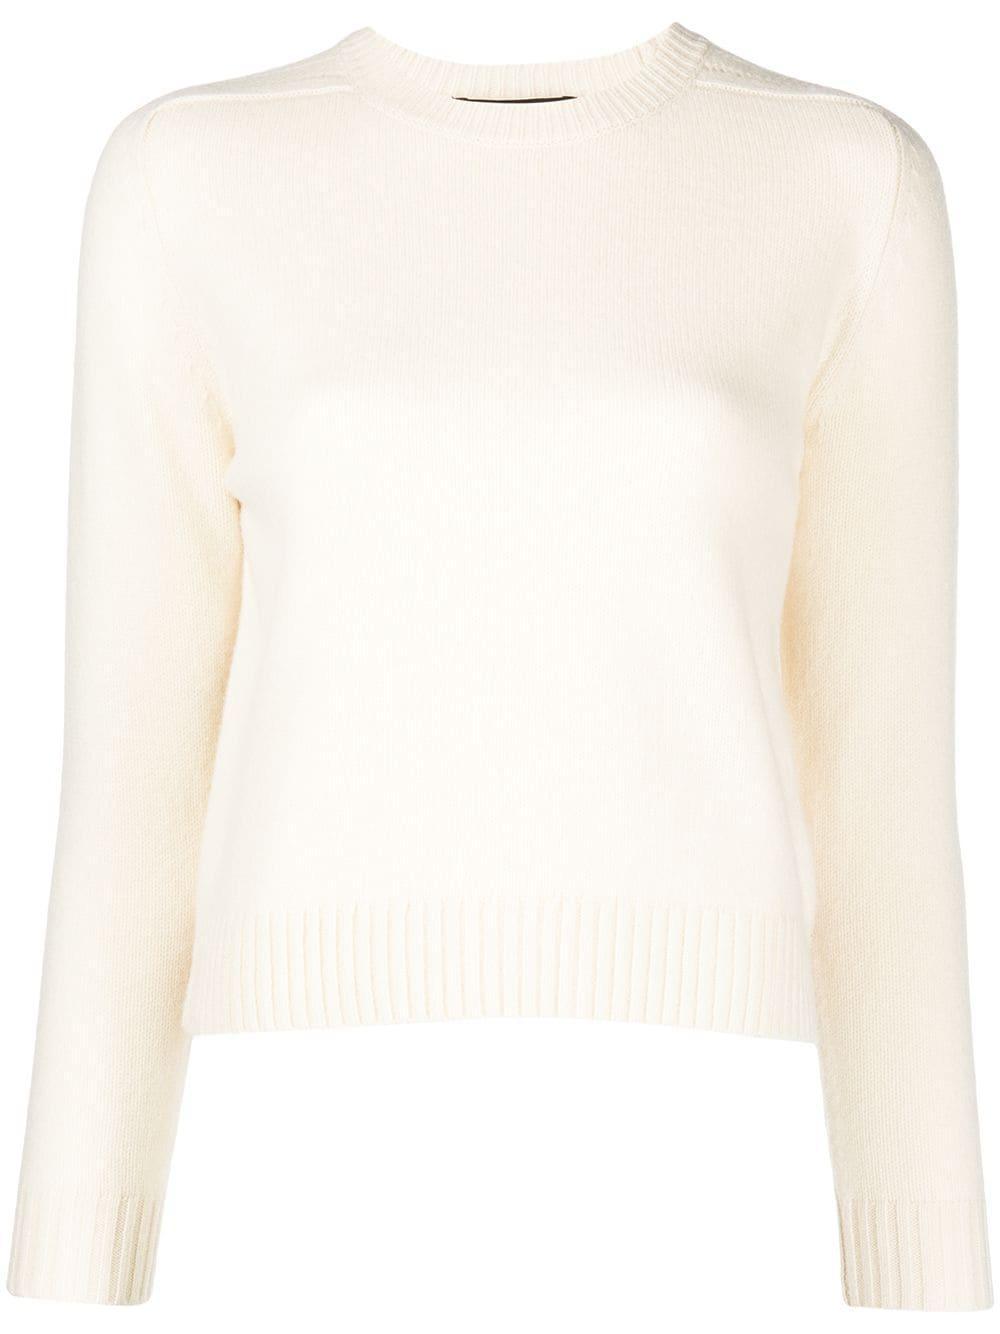 Sirena Sweater Item # 80400-Y144